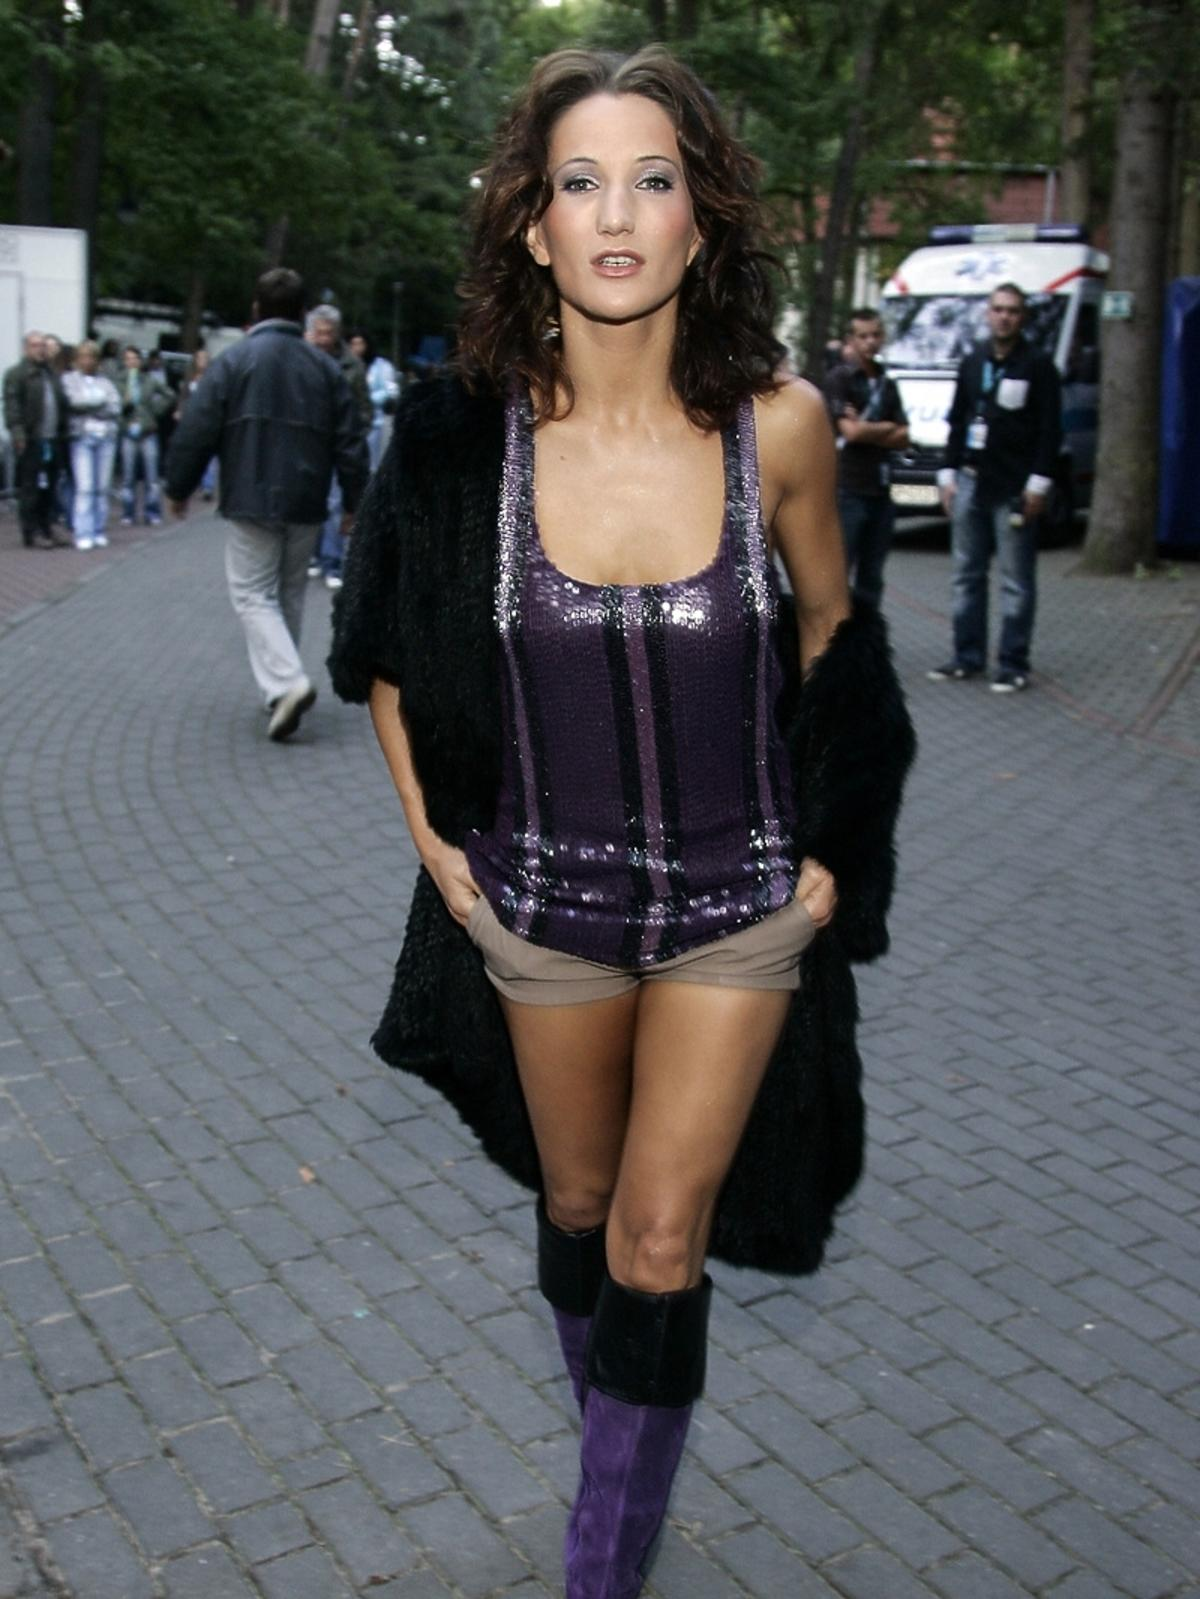 Justyna Steczkowska 10 lat temu